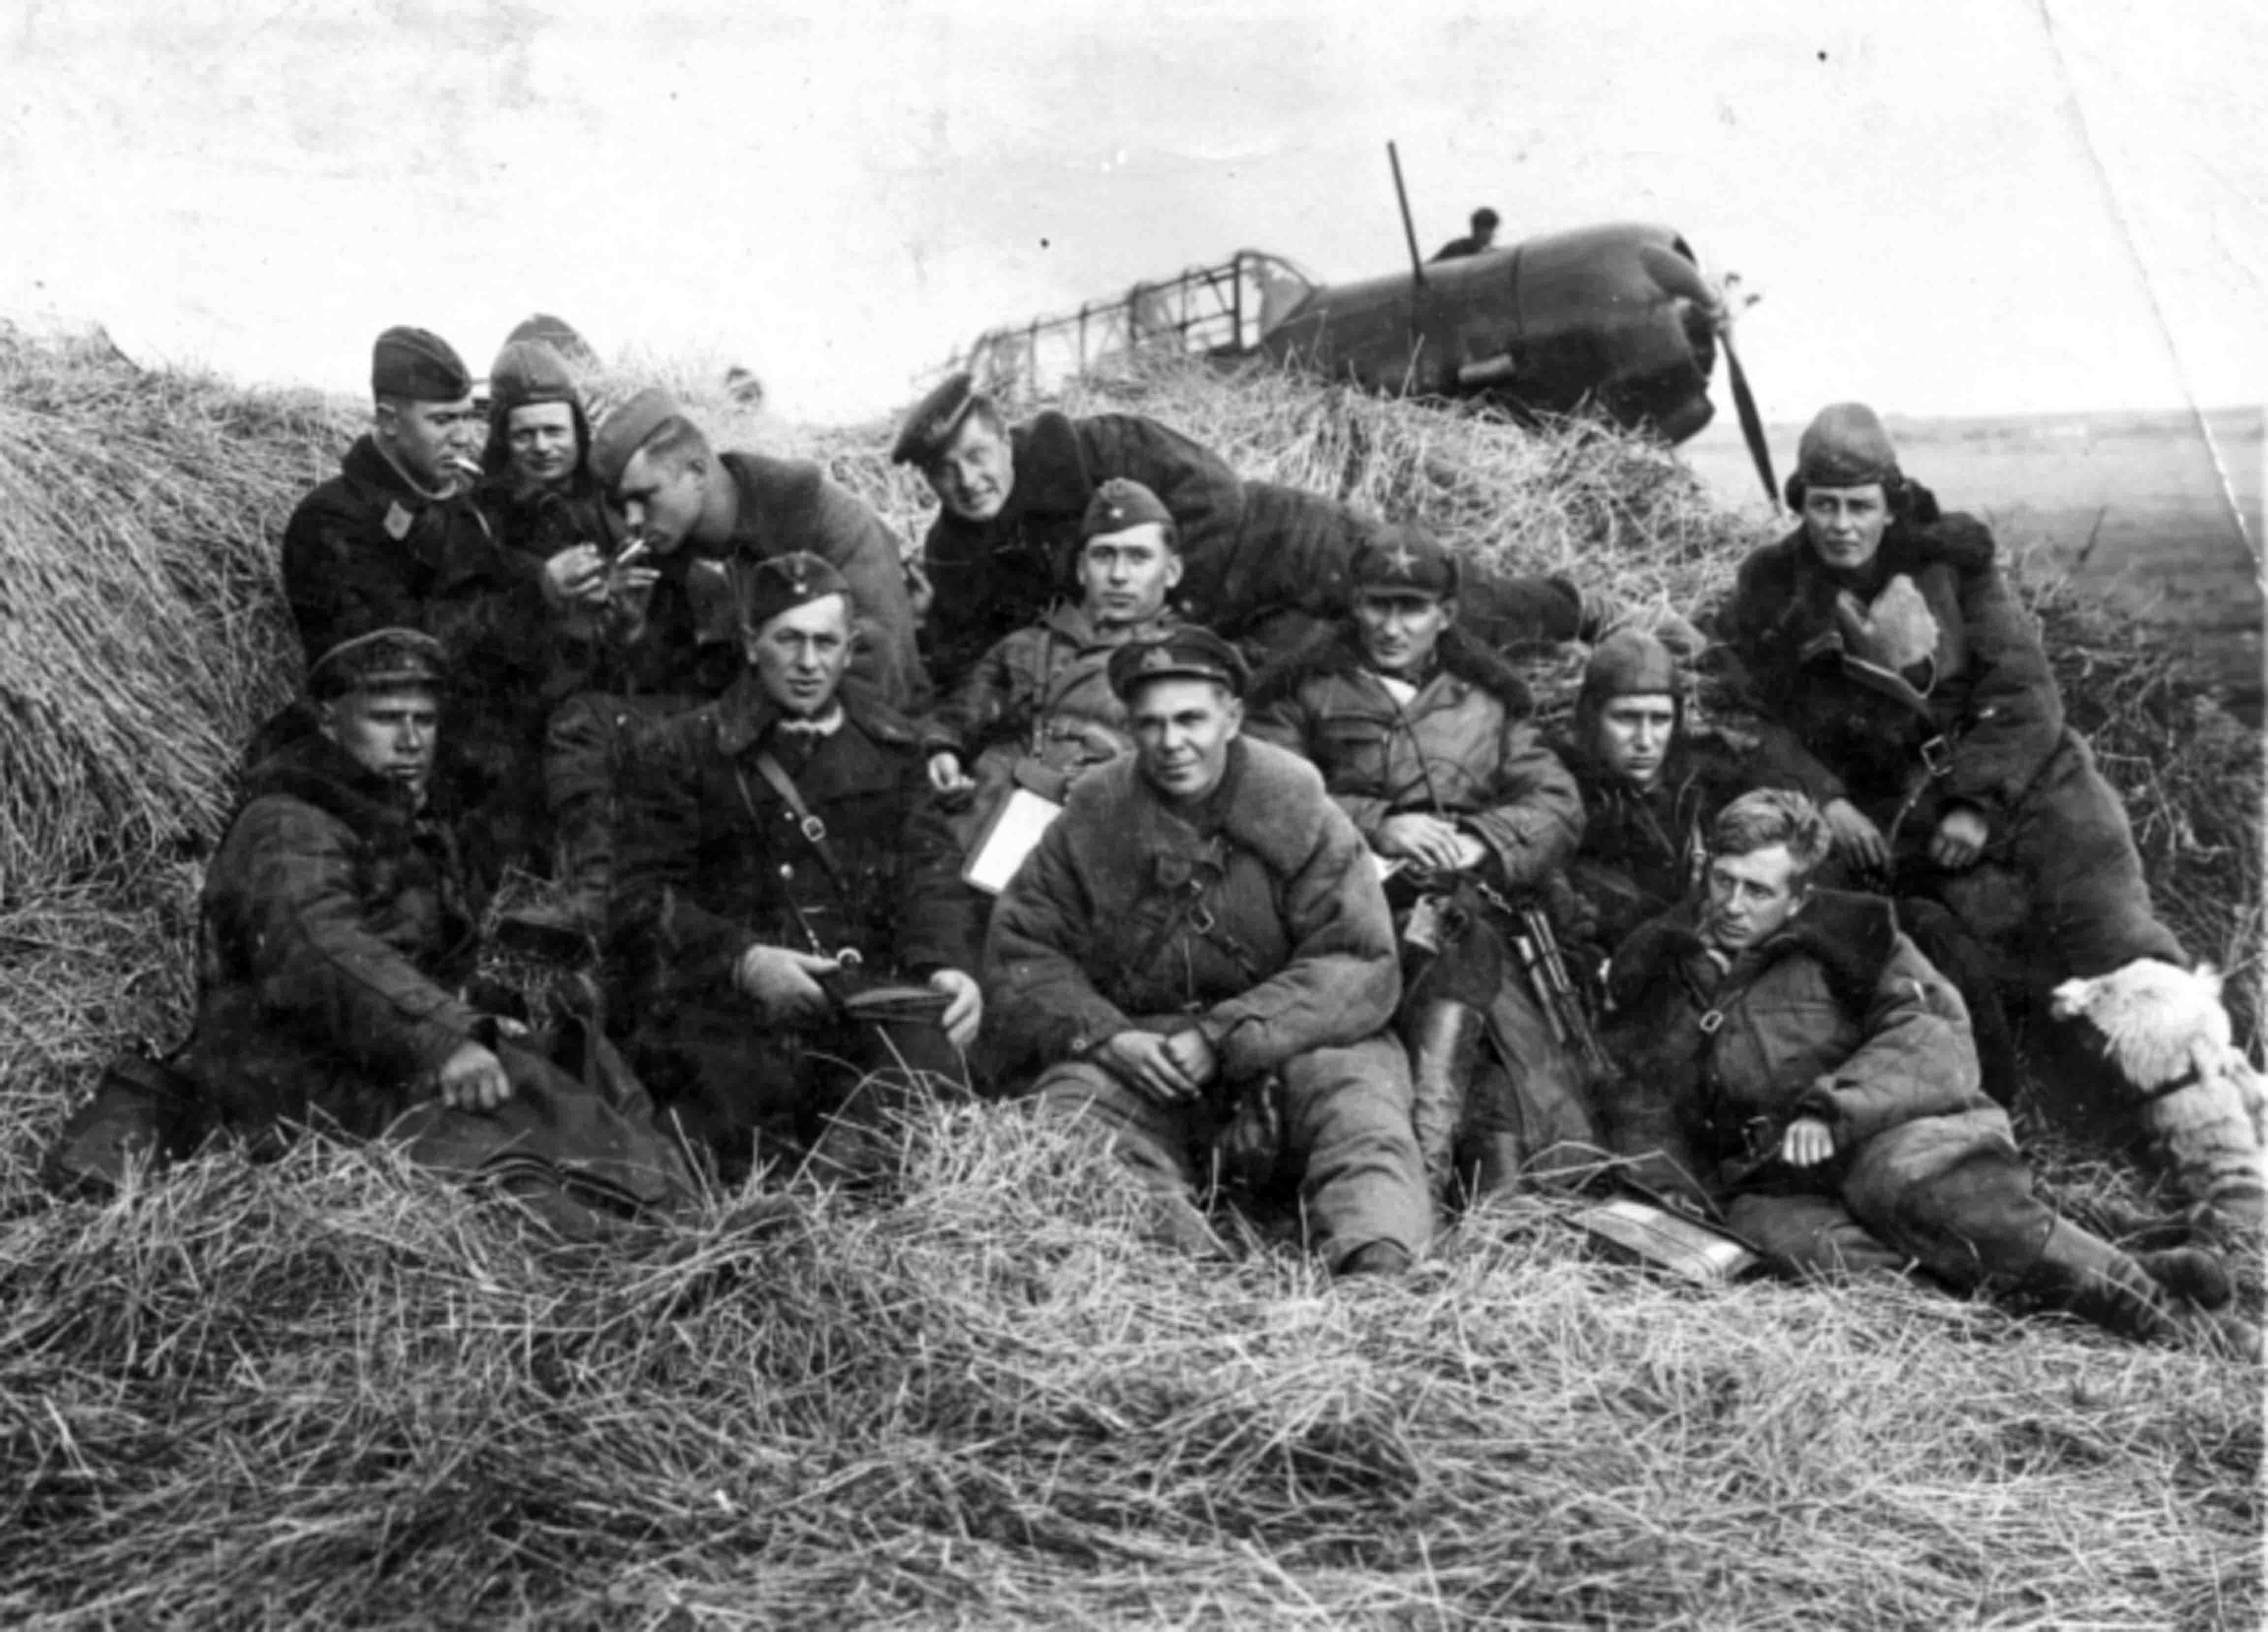 Bomber Aviation Regiment